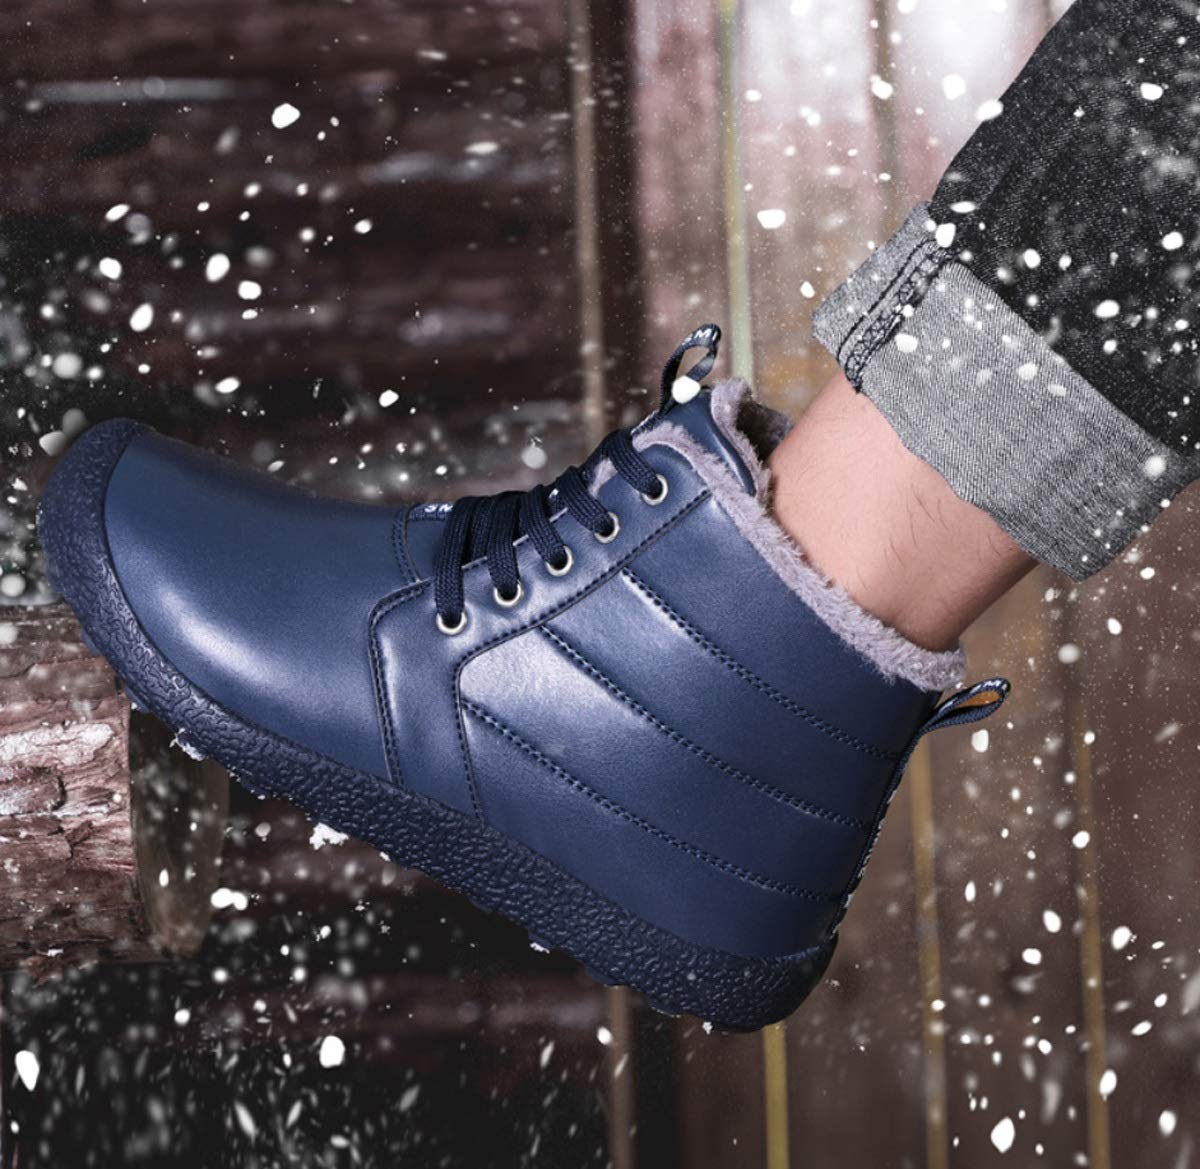 DANDANJIE Herren Schneestiefel Warme High-Top Sport Sport Sport Wanderschuhe mit Schnür-Turnschuhe Casual Outdoor-Schuhe für den Winter 4d026a